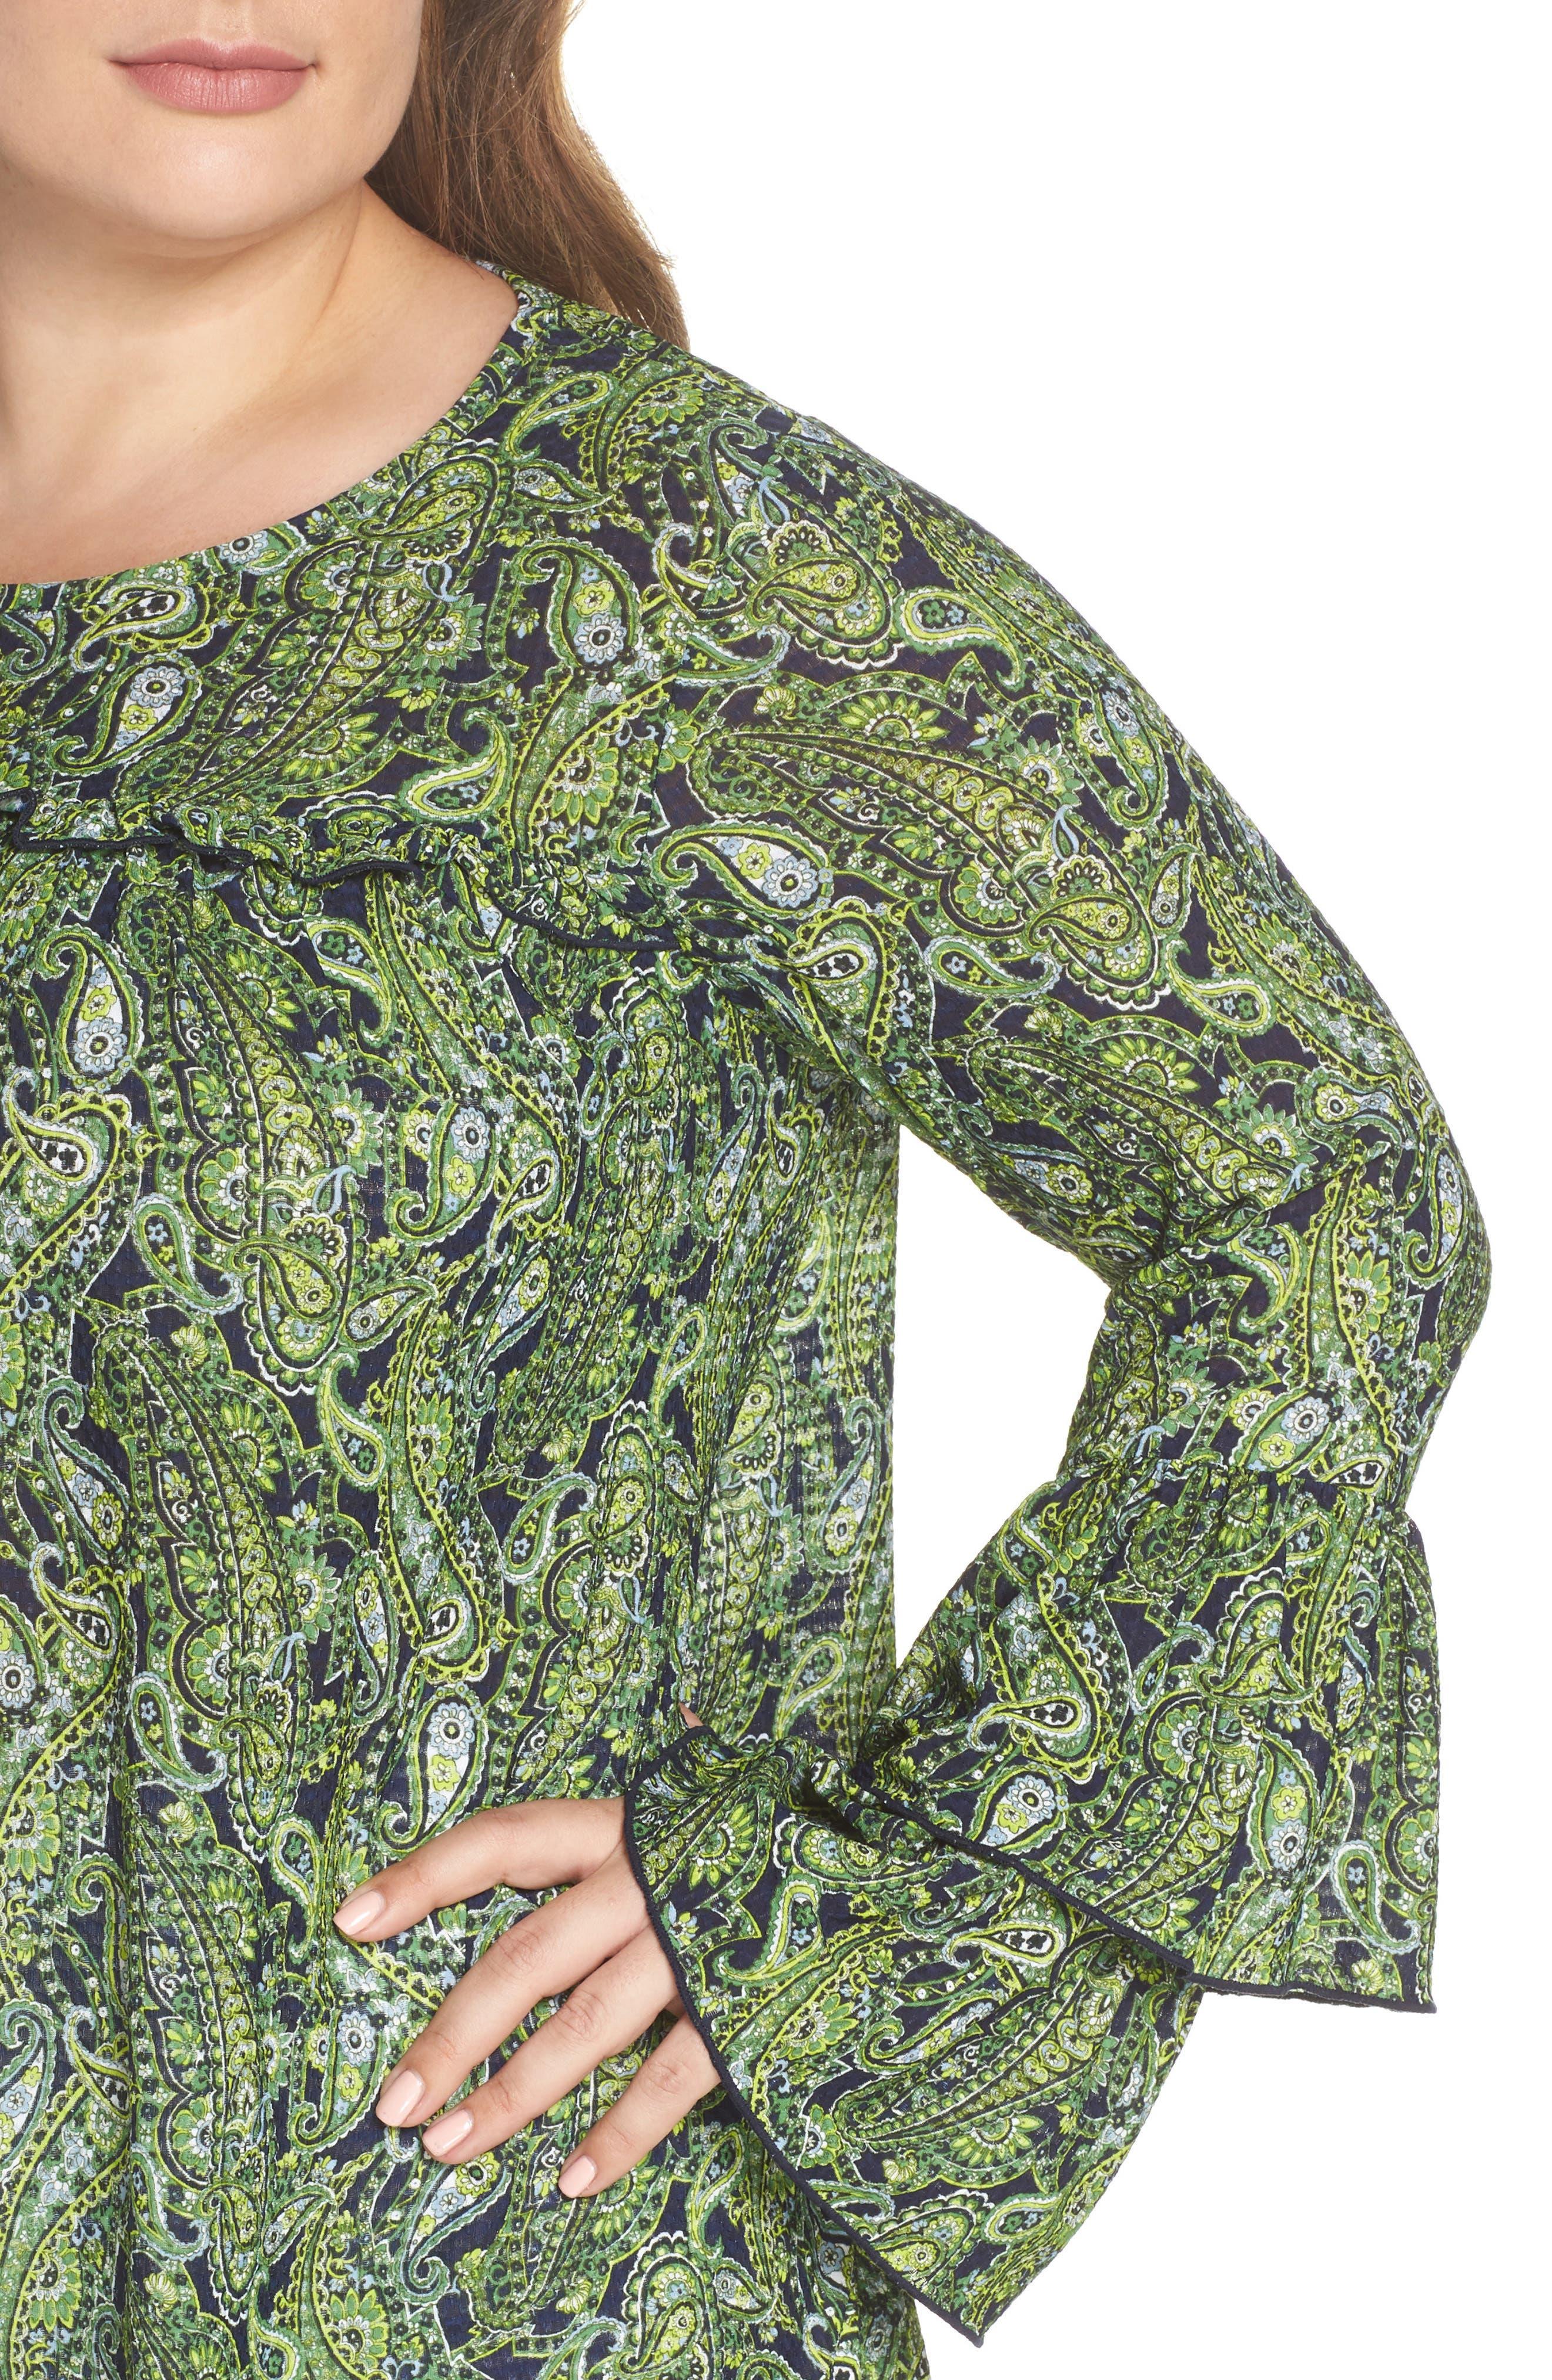 Pais Tier Sleeve Blouse,                             Alternate thumbnail 4, color,                             True Navy/ Green Apple Mu